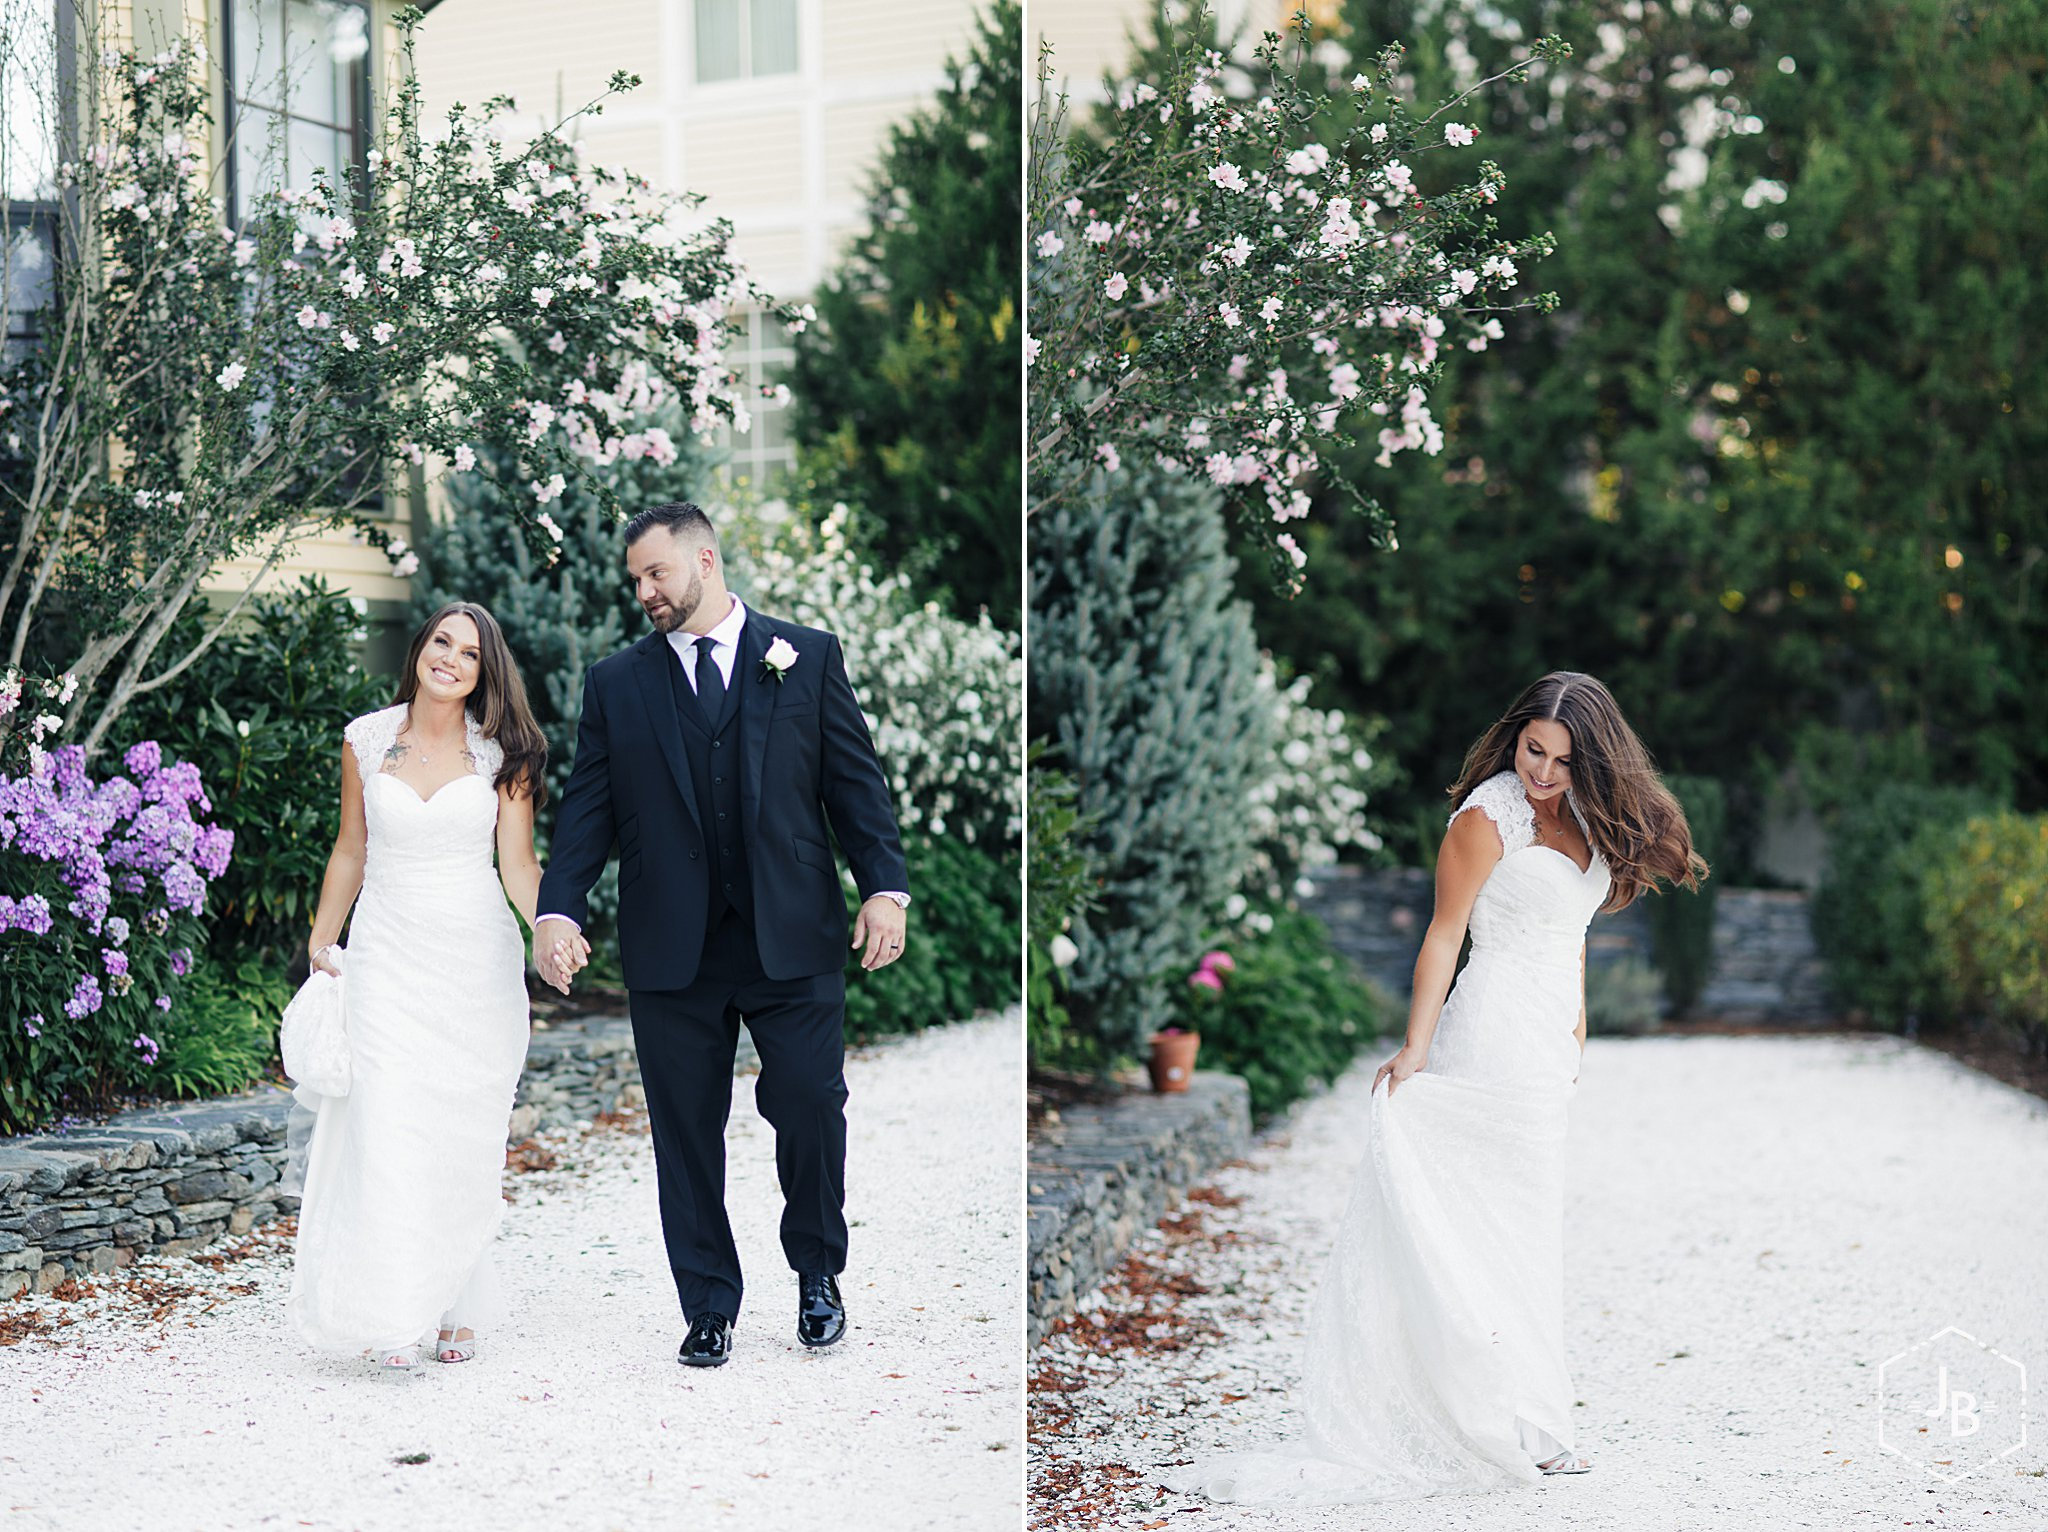 WeddingandEngagementFloridaPhotographer_2924.jpg